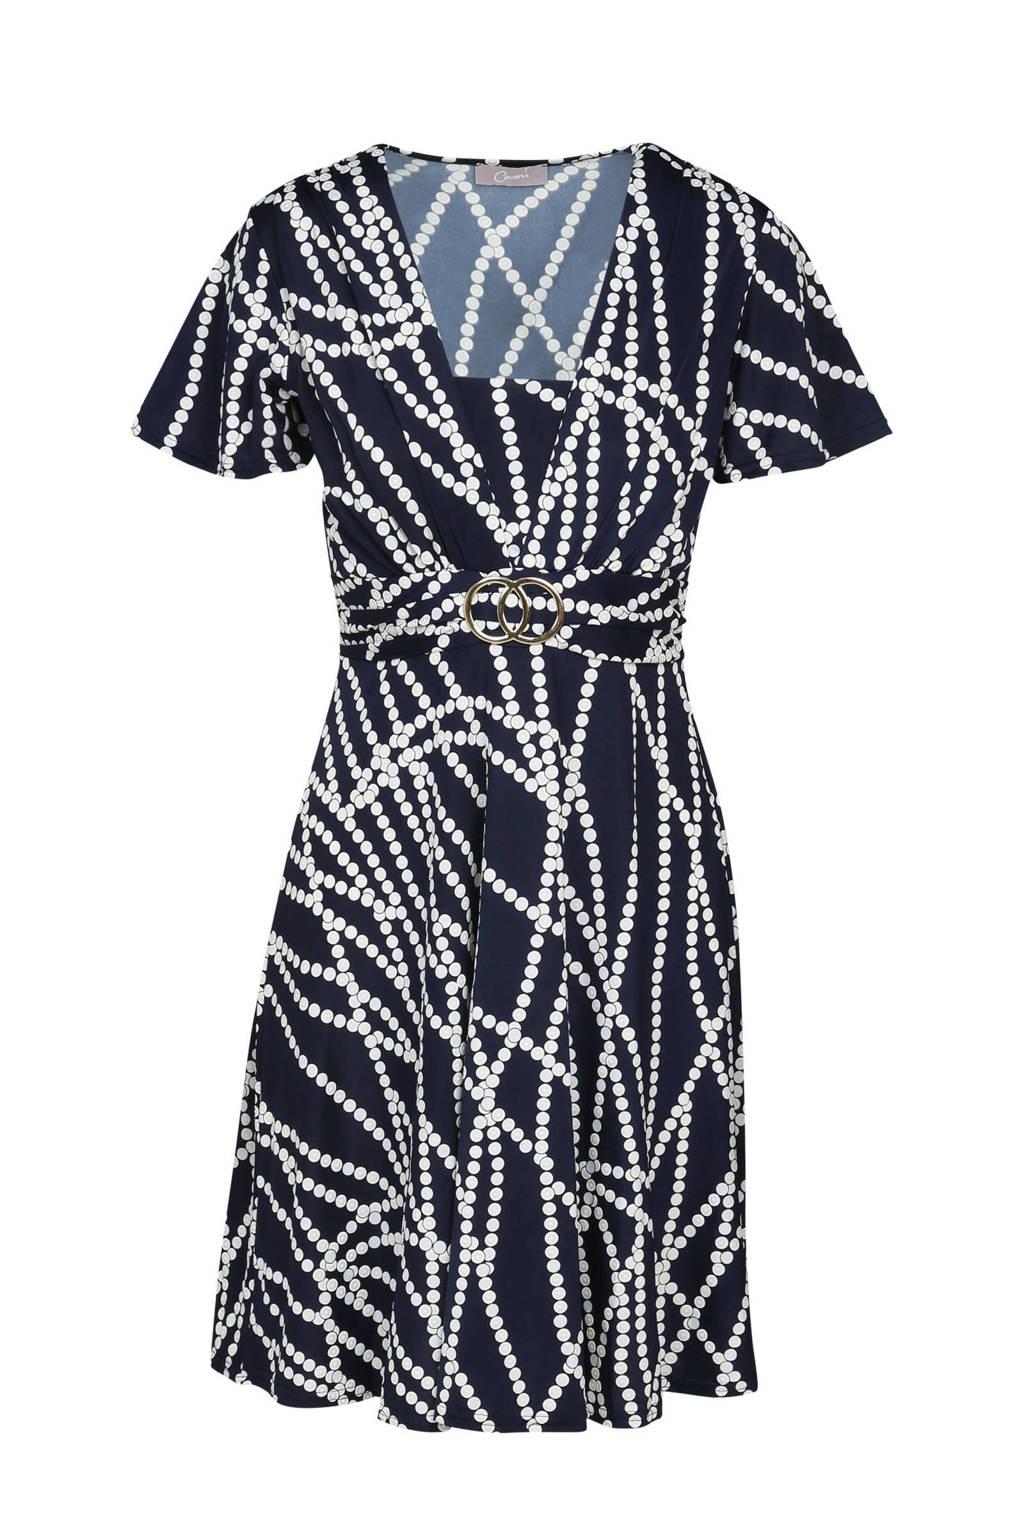 Cassis jurk met all over print donkerblauw, Donkerblauw